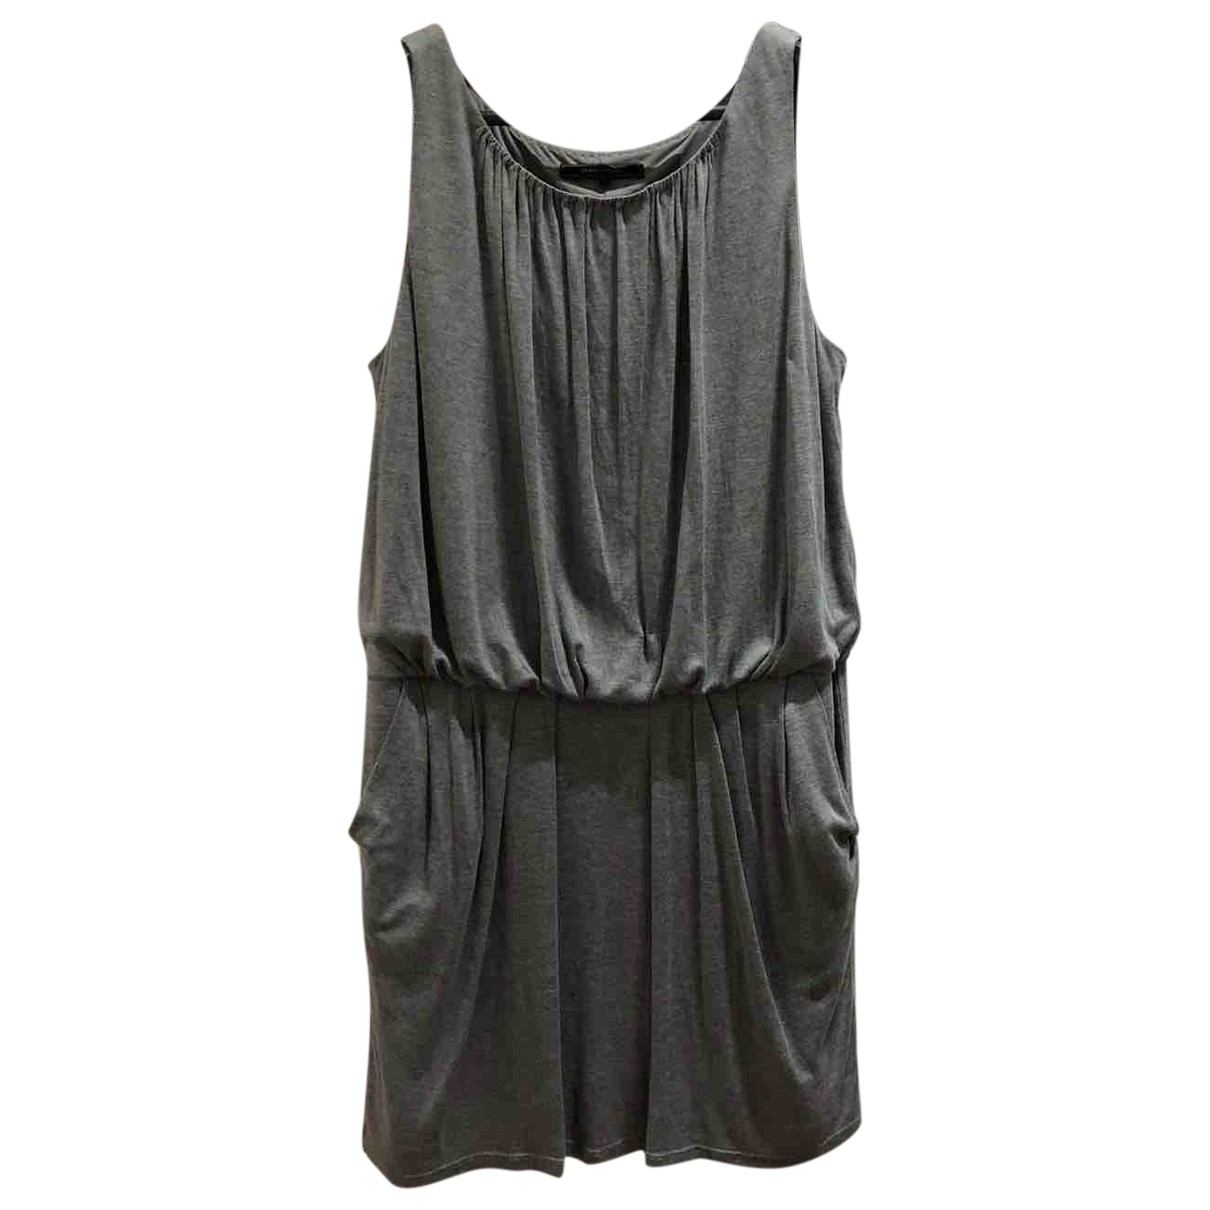 Bcbg Max Azria \N Kleid in  Grau Baumwolle